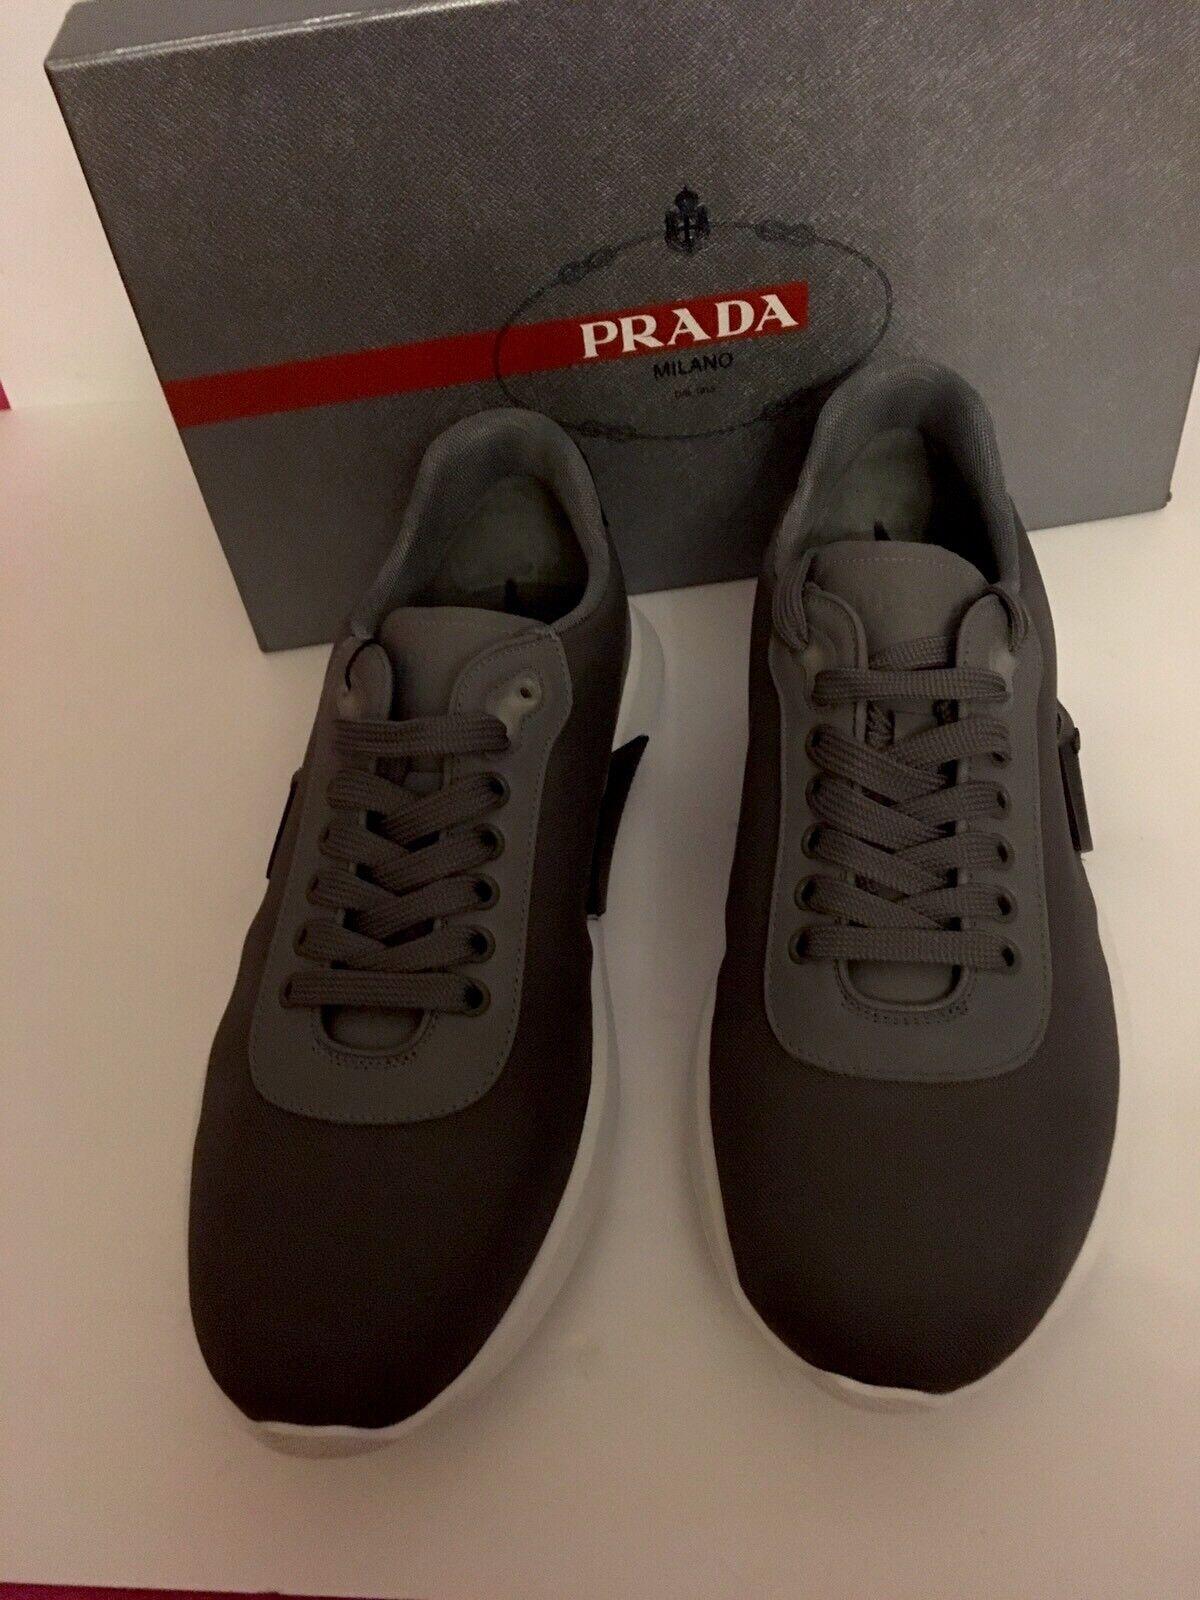 Prada Sneaker Gr 43,5 ( 9,5 ) und Gr 44 (10) Neu